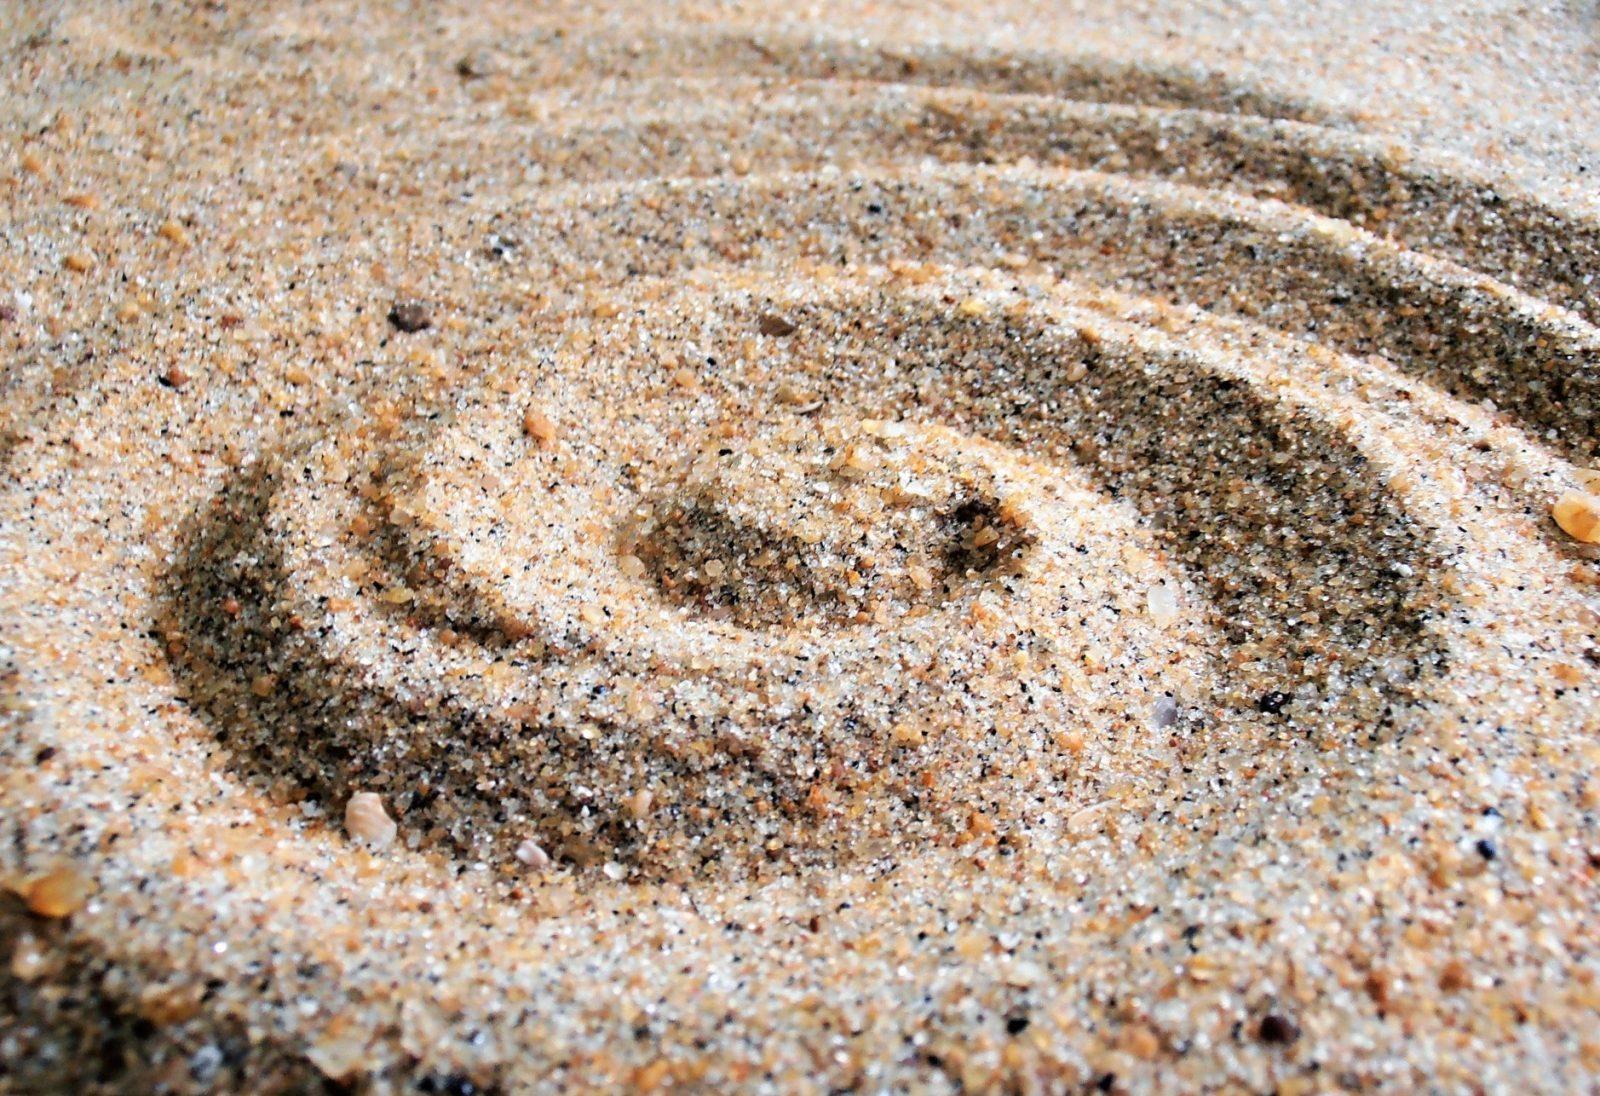 sand 883068 1920